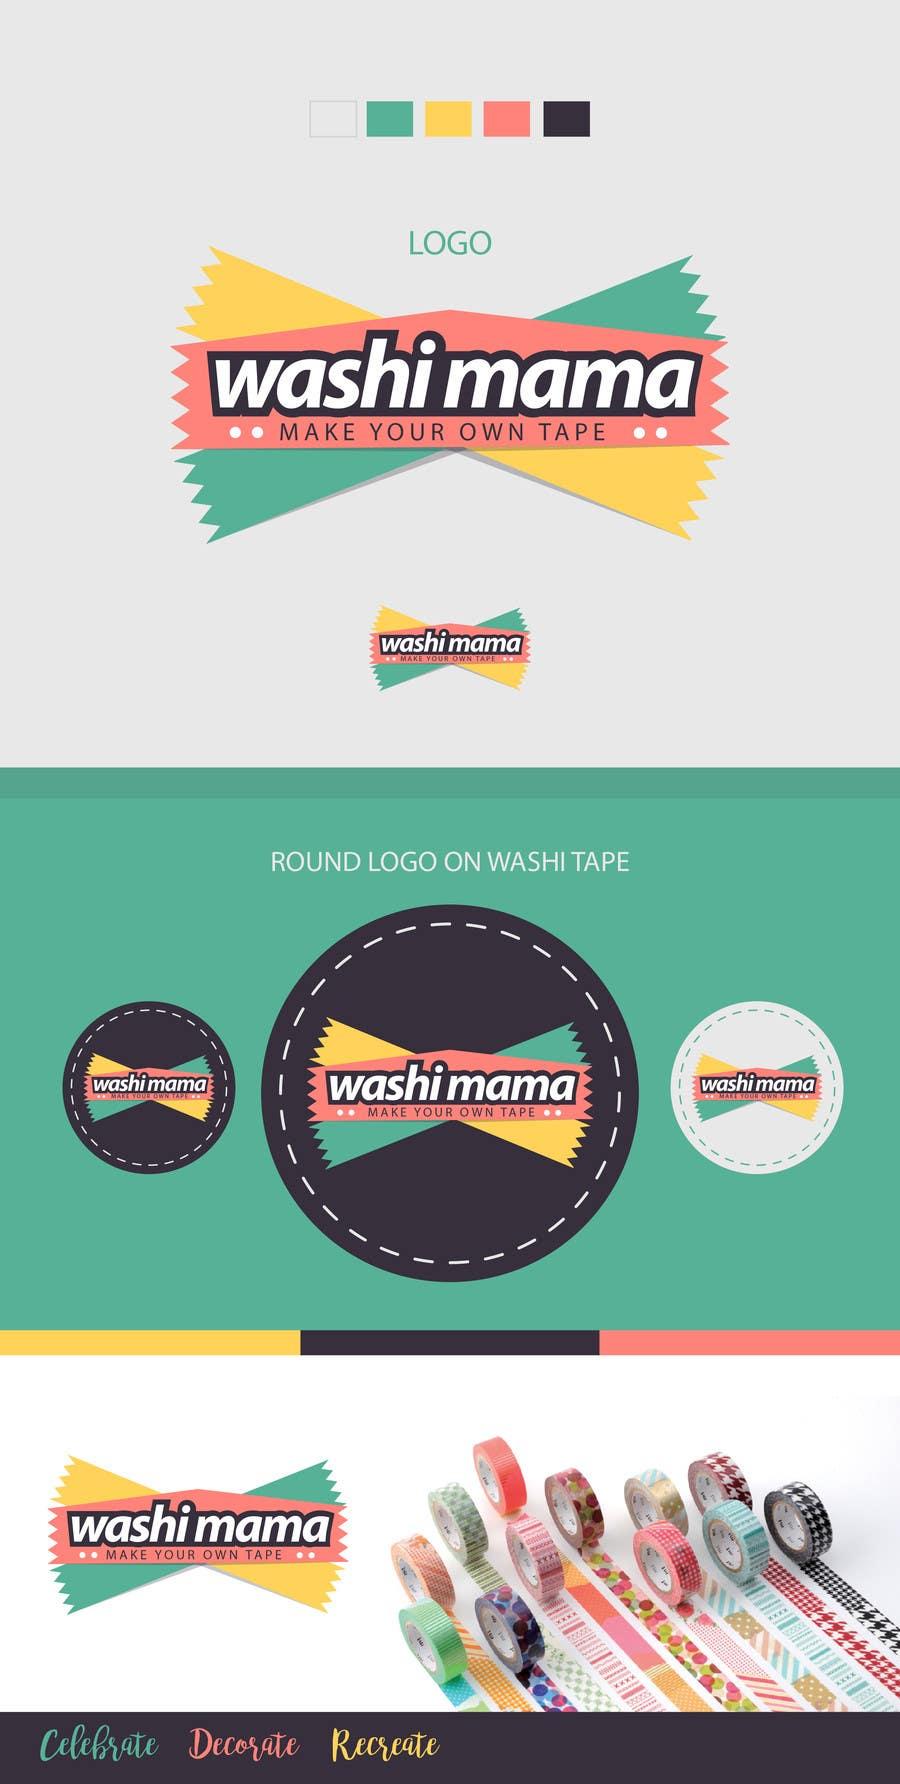 Proposition n°                                        6                                      du concours                                         Design a Website Banner and Logo